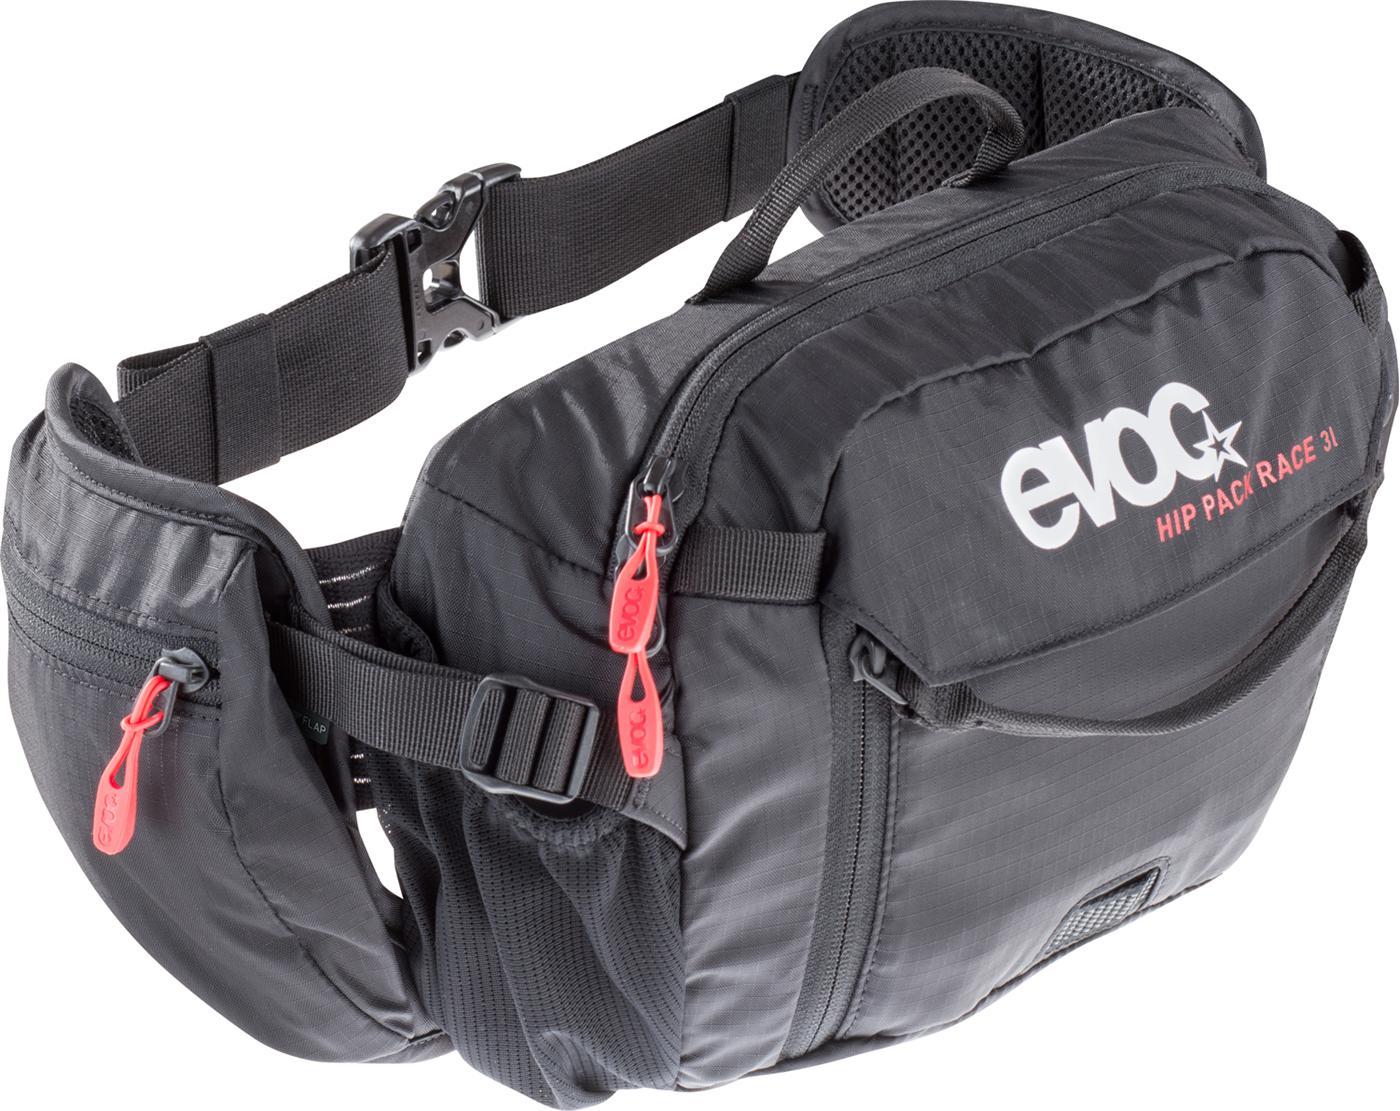 WEB_Image EVOC Hip Pack Race 3L- Enduro hofteveske-354310090.jpg